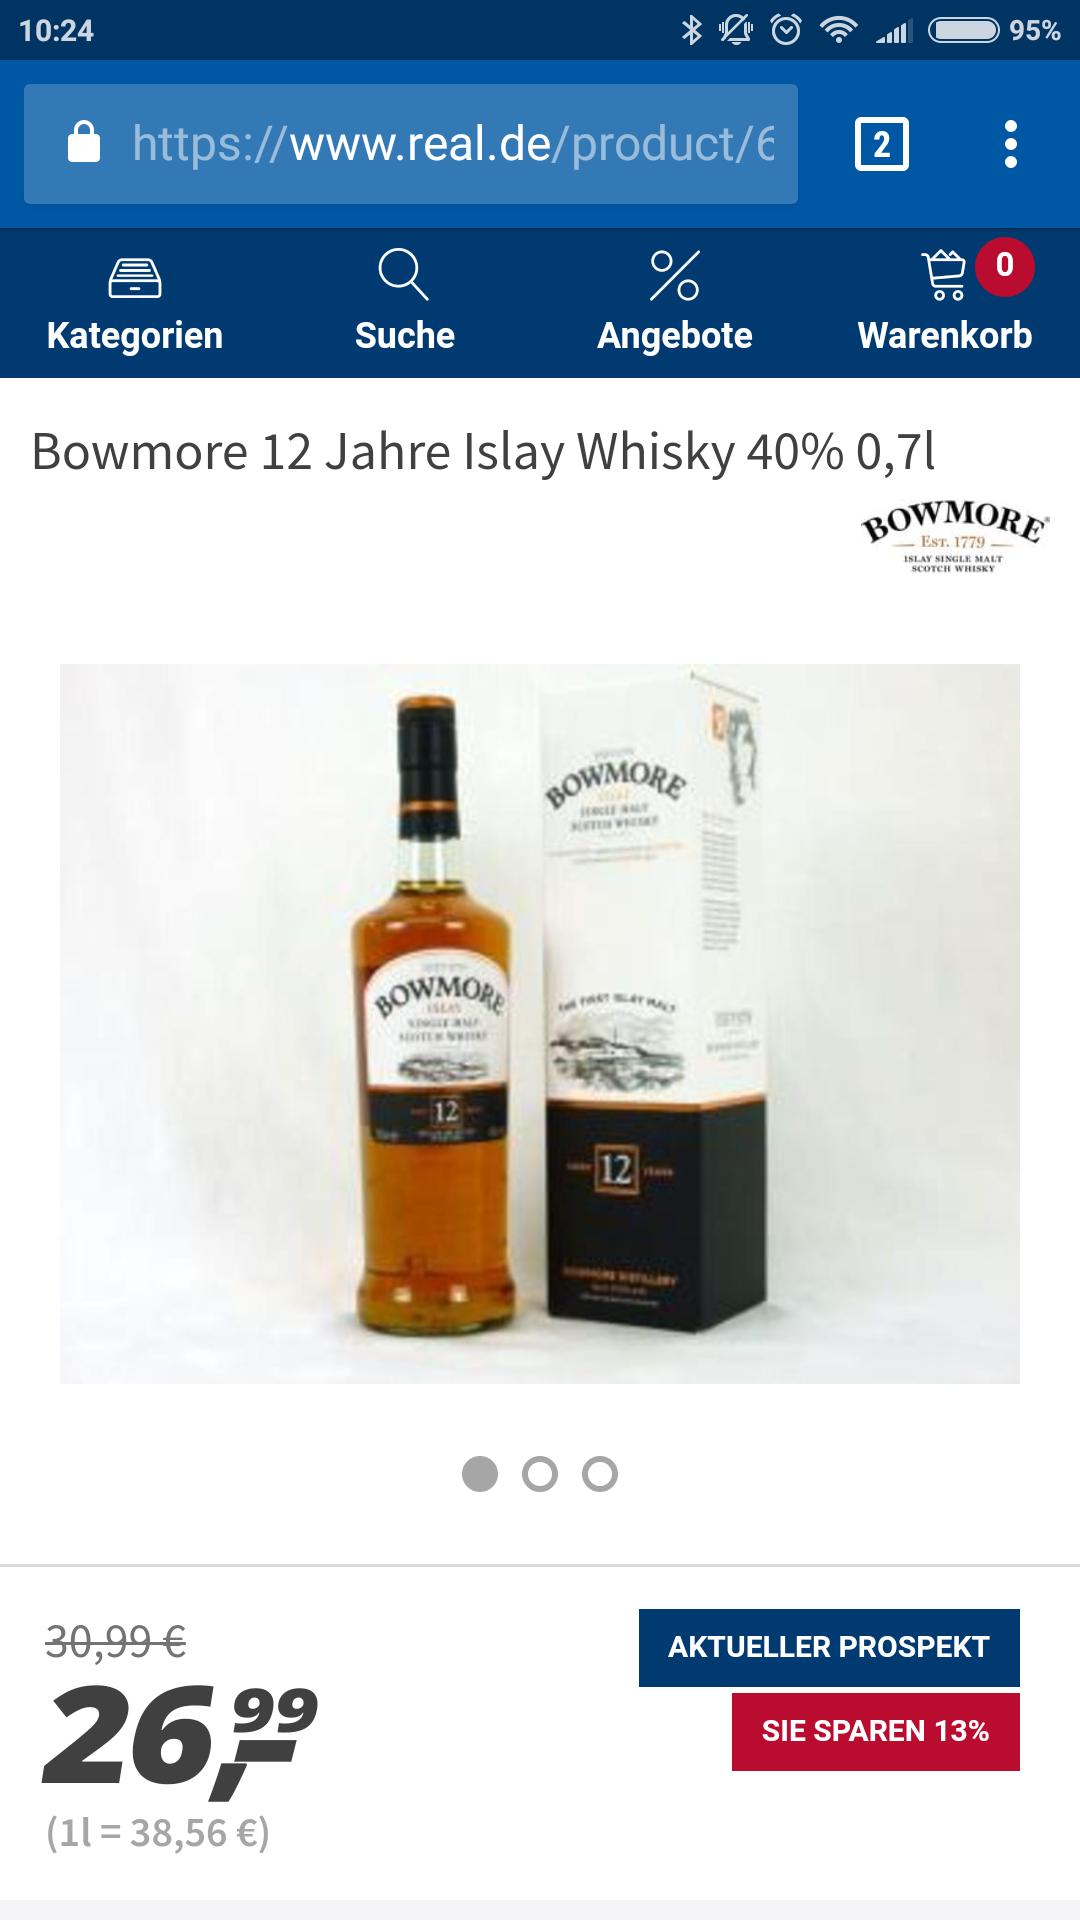 [offline, lokal OWL] Bowmore 12 für 26,99 im real